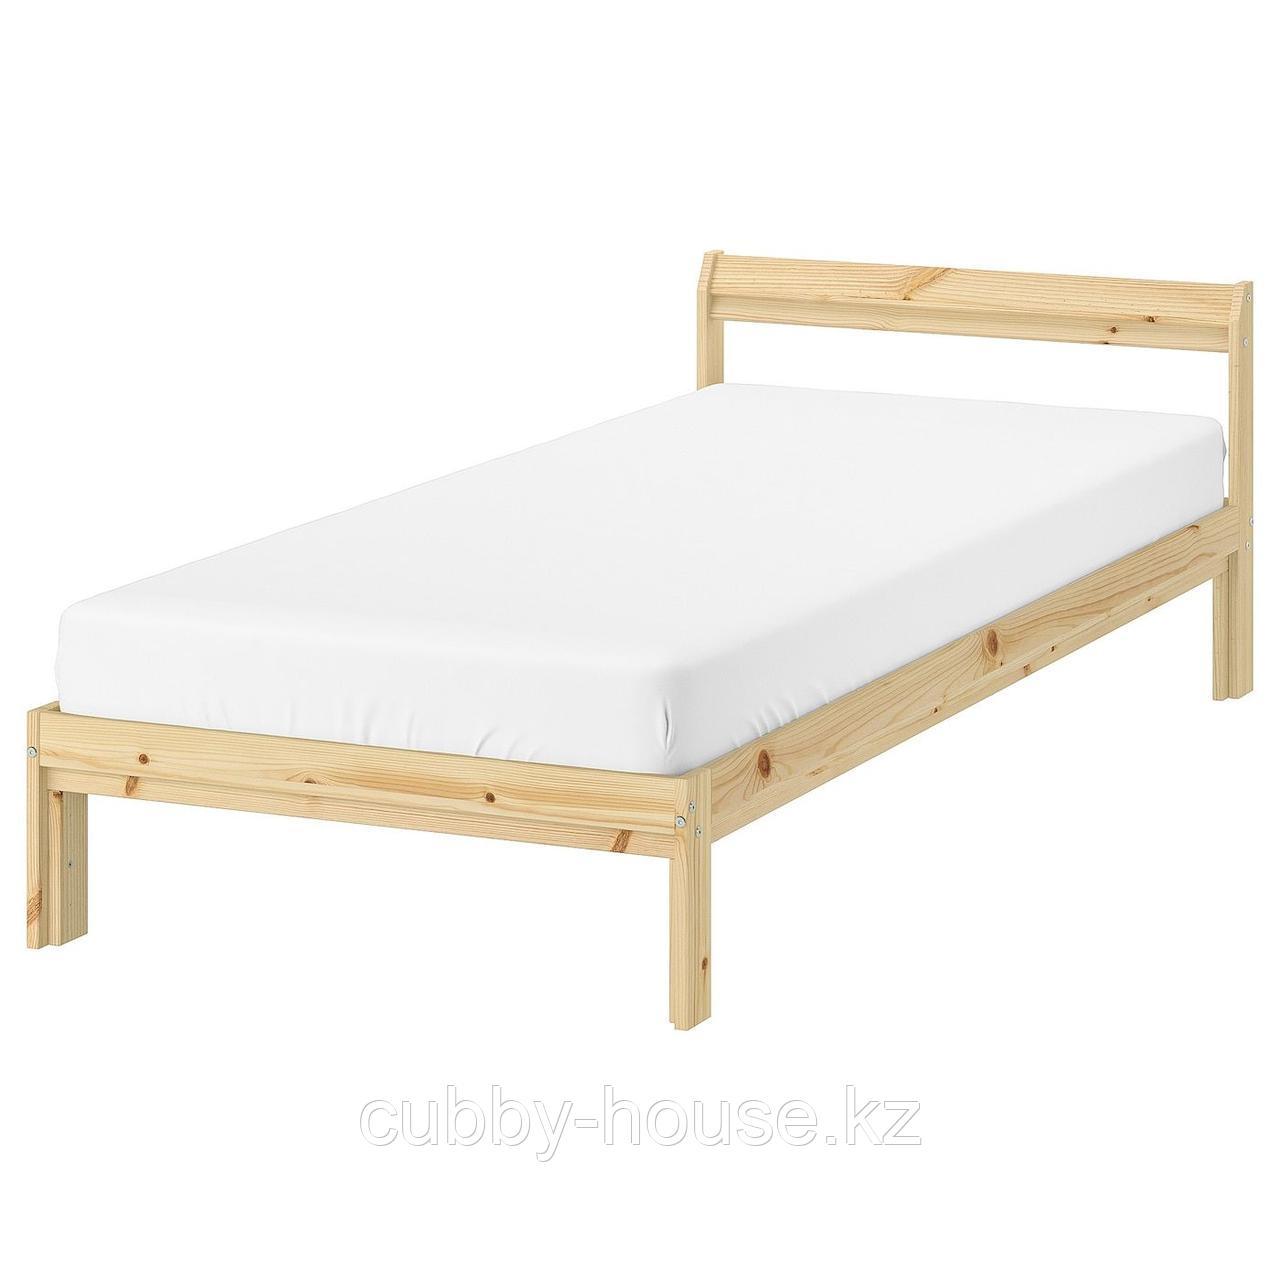 НЕЙДЕН Каркас кровати, сосна, Лурой, 90x200 см